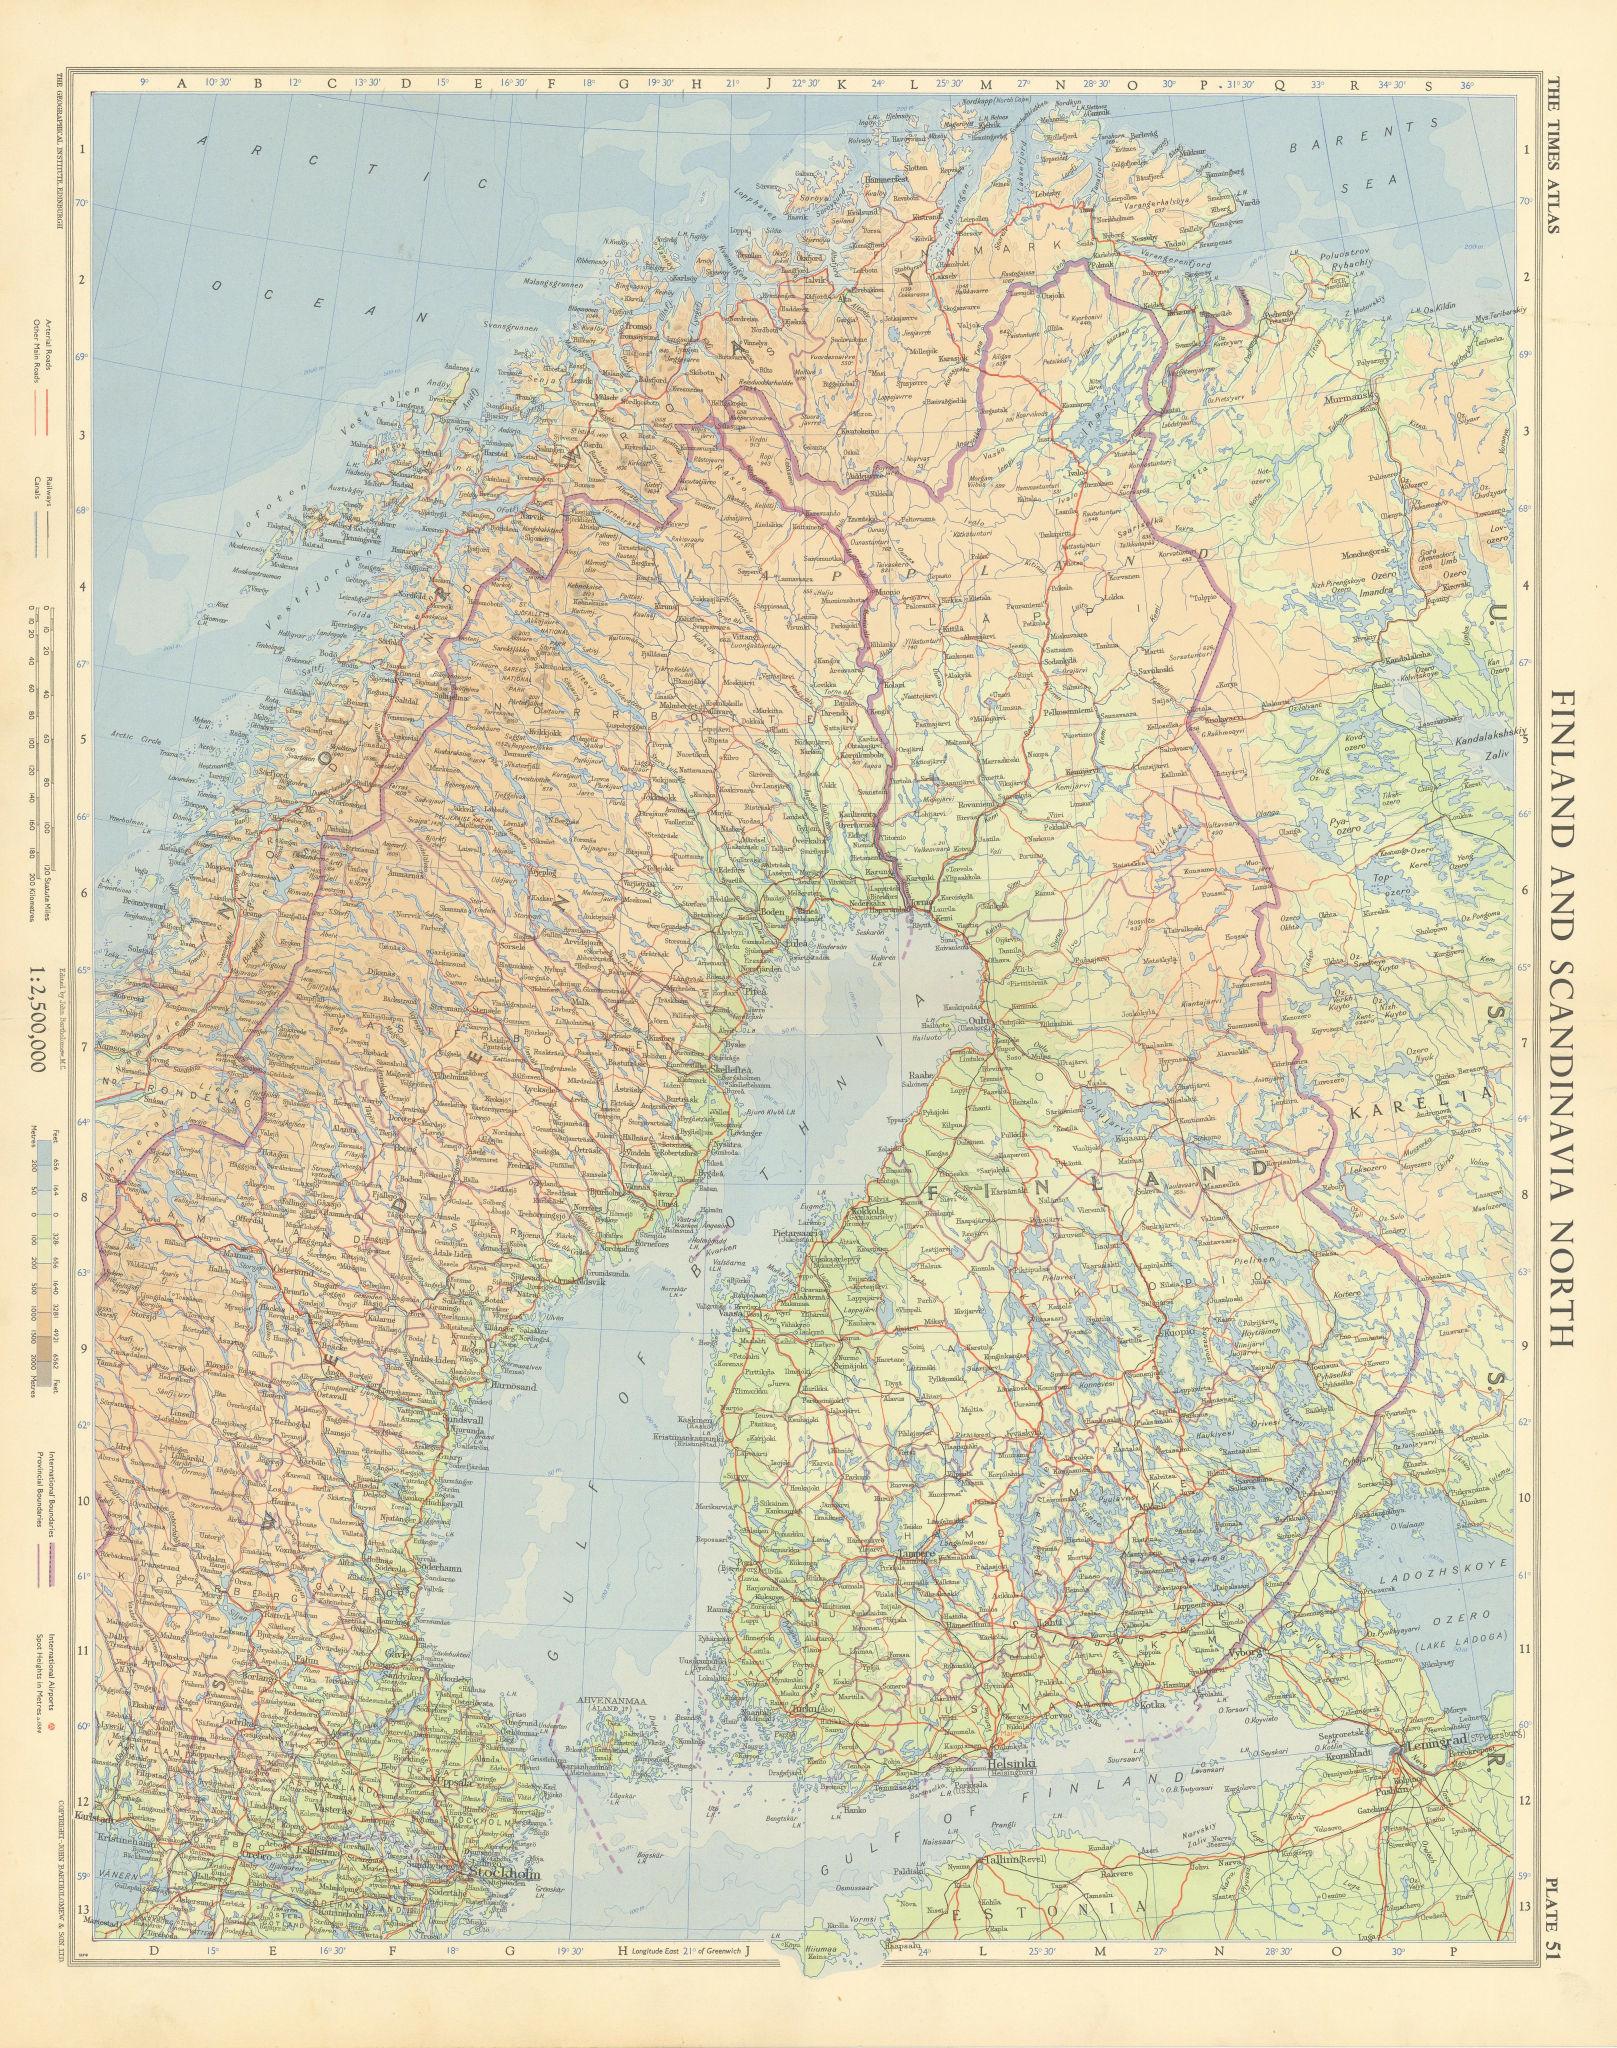 Finland & northern Scandinavia. Sweden & Norway. Gulf of Bothnia. TIMES 1955 map